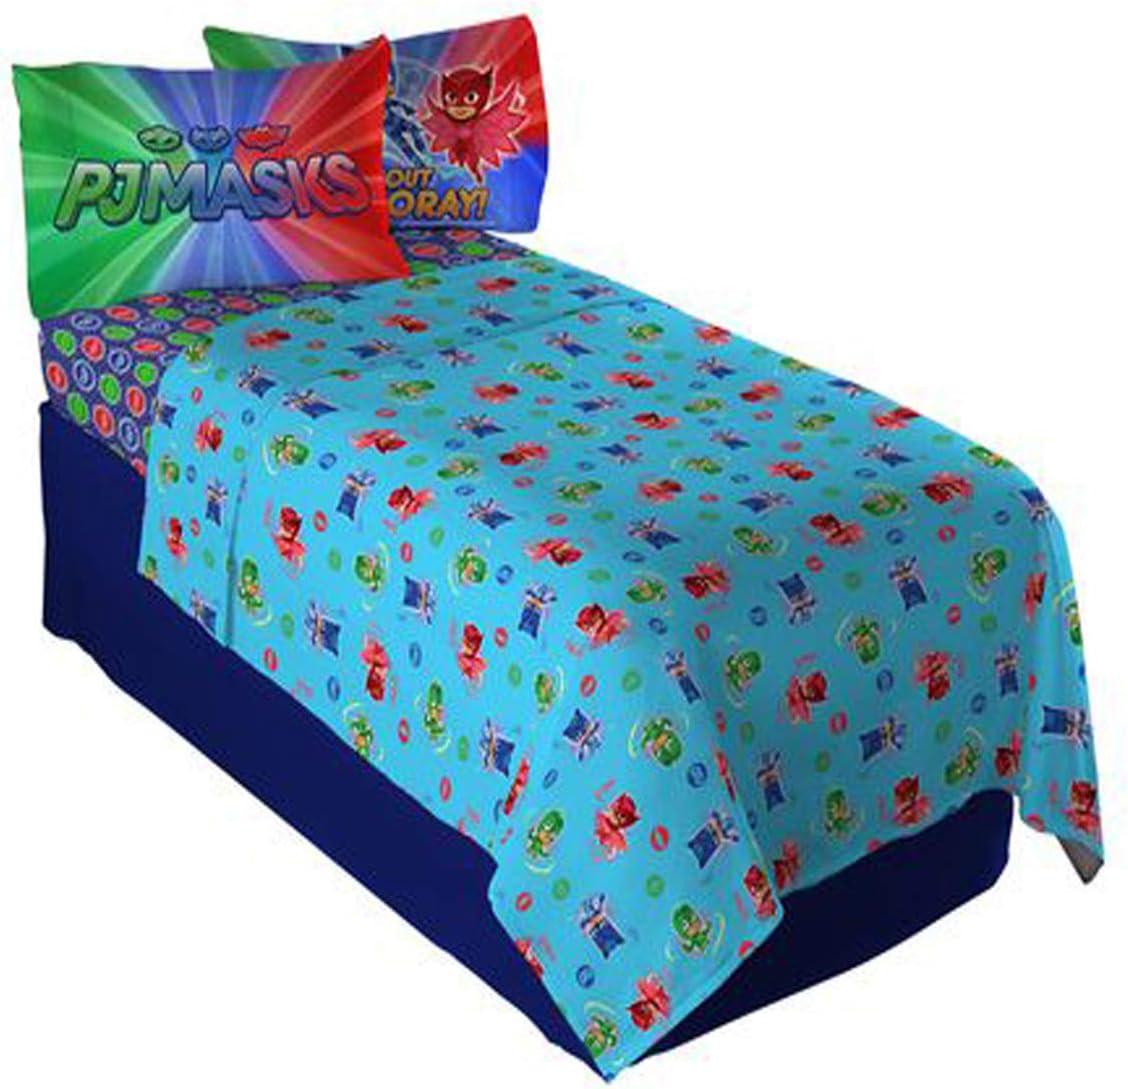 "PJ Masks ""It's Hero Time Full Sheet Set for Kids 4pc Bedding Sheet Set - 81 X 96 Inch [Blue]"